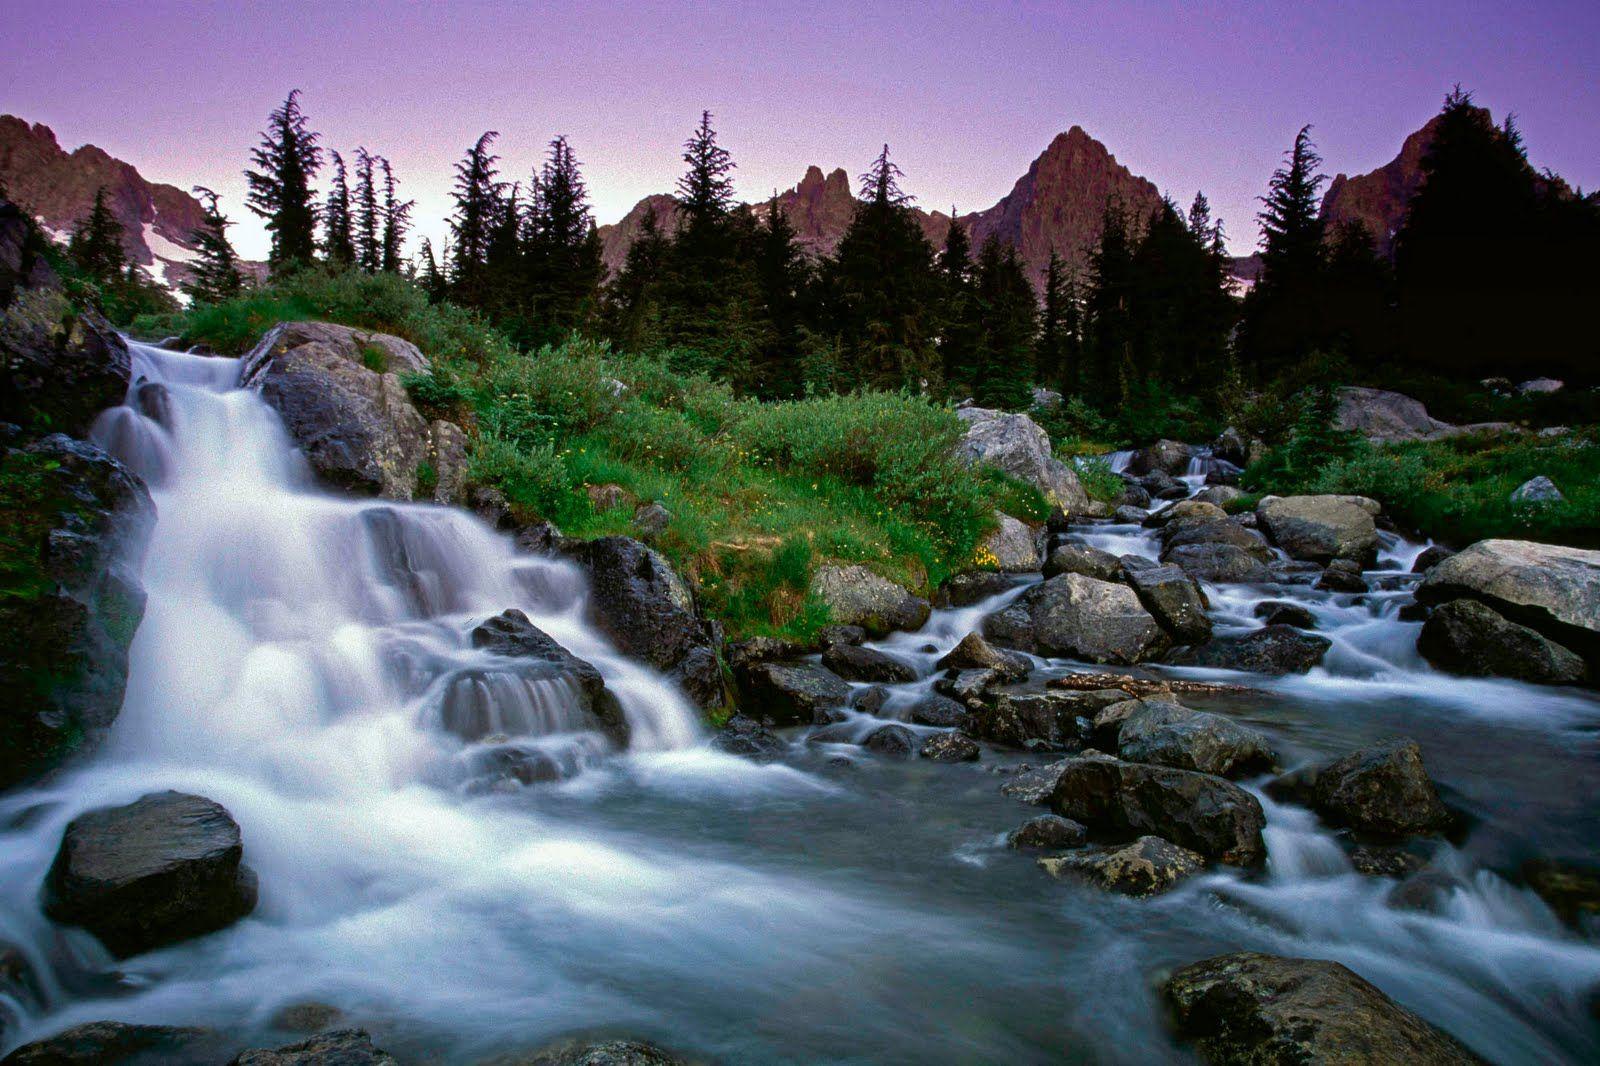 Supernatural Wallpapers Super Natural Cool Wallpapers Most Beautiful Nature Part 27 Ansel Adams Waterfall Beautiful Nature